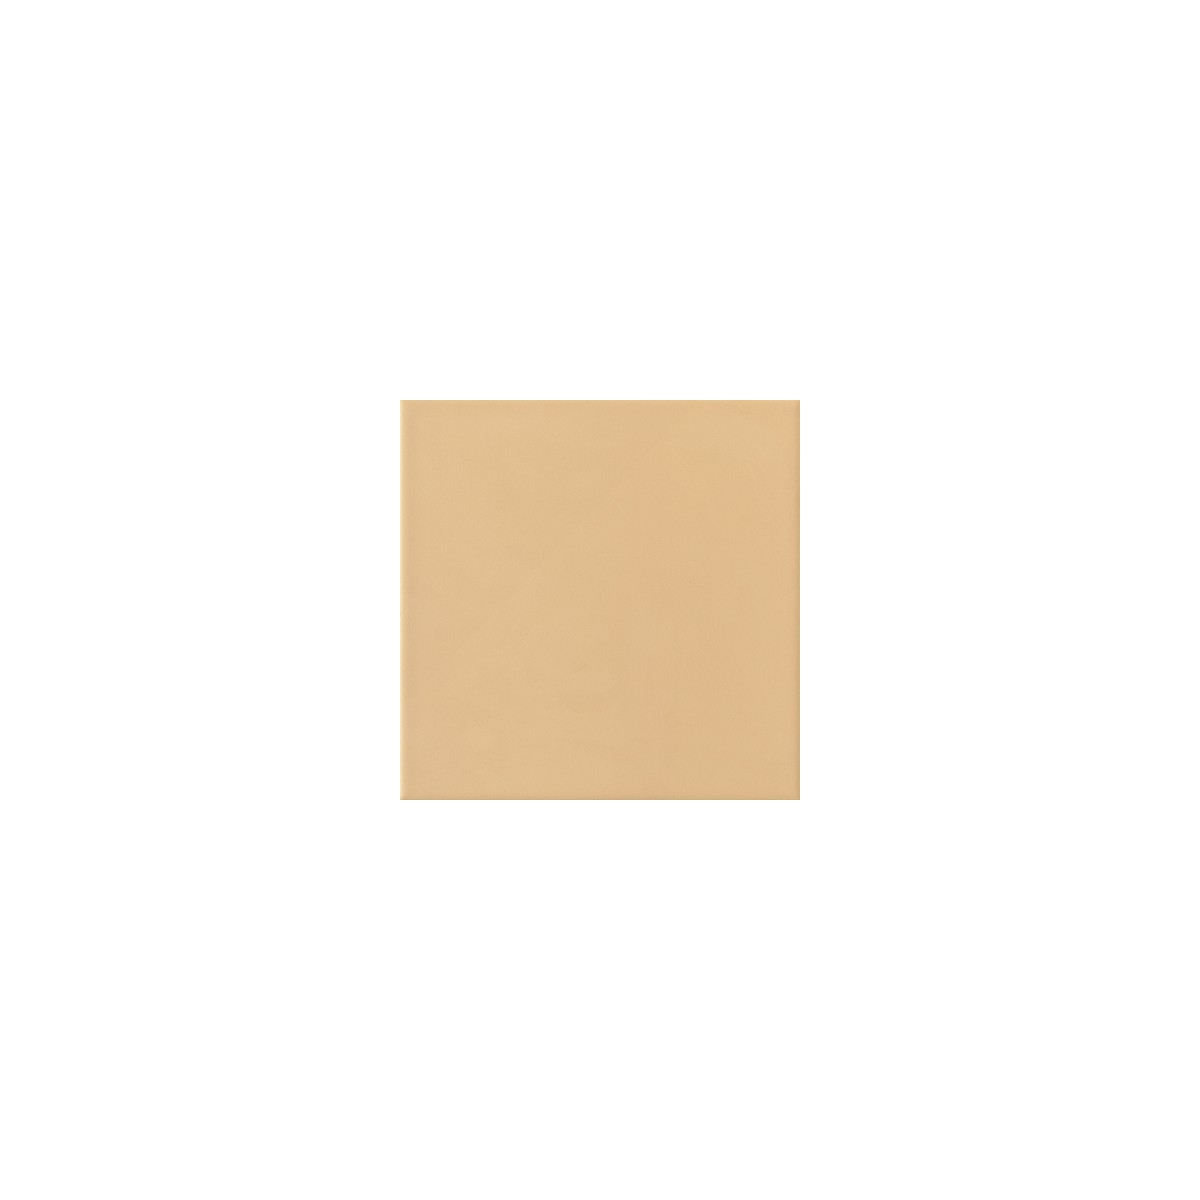 Color beige oscuro mate - Colección Colores Mate - Marca Mainzu